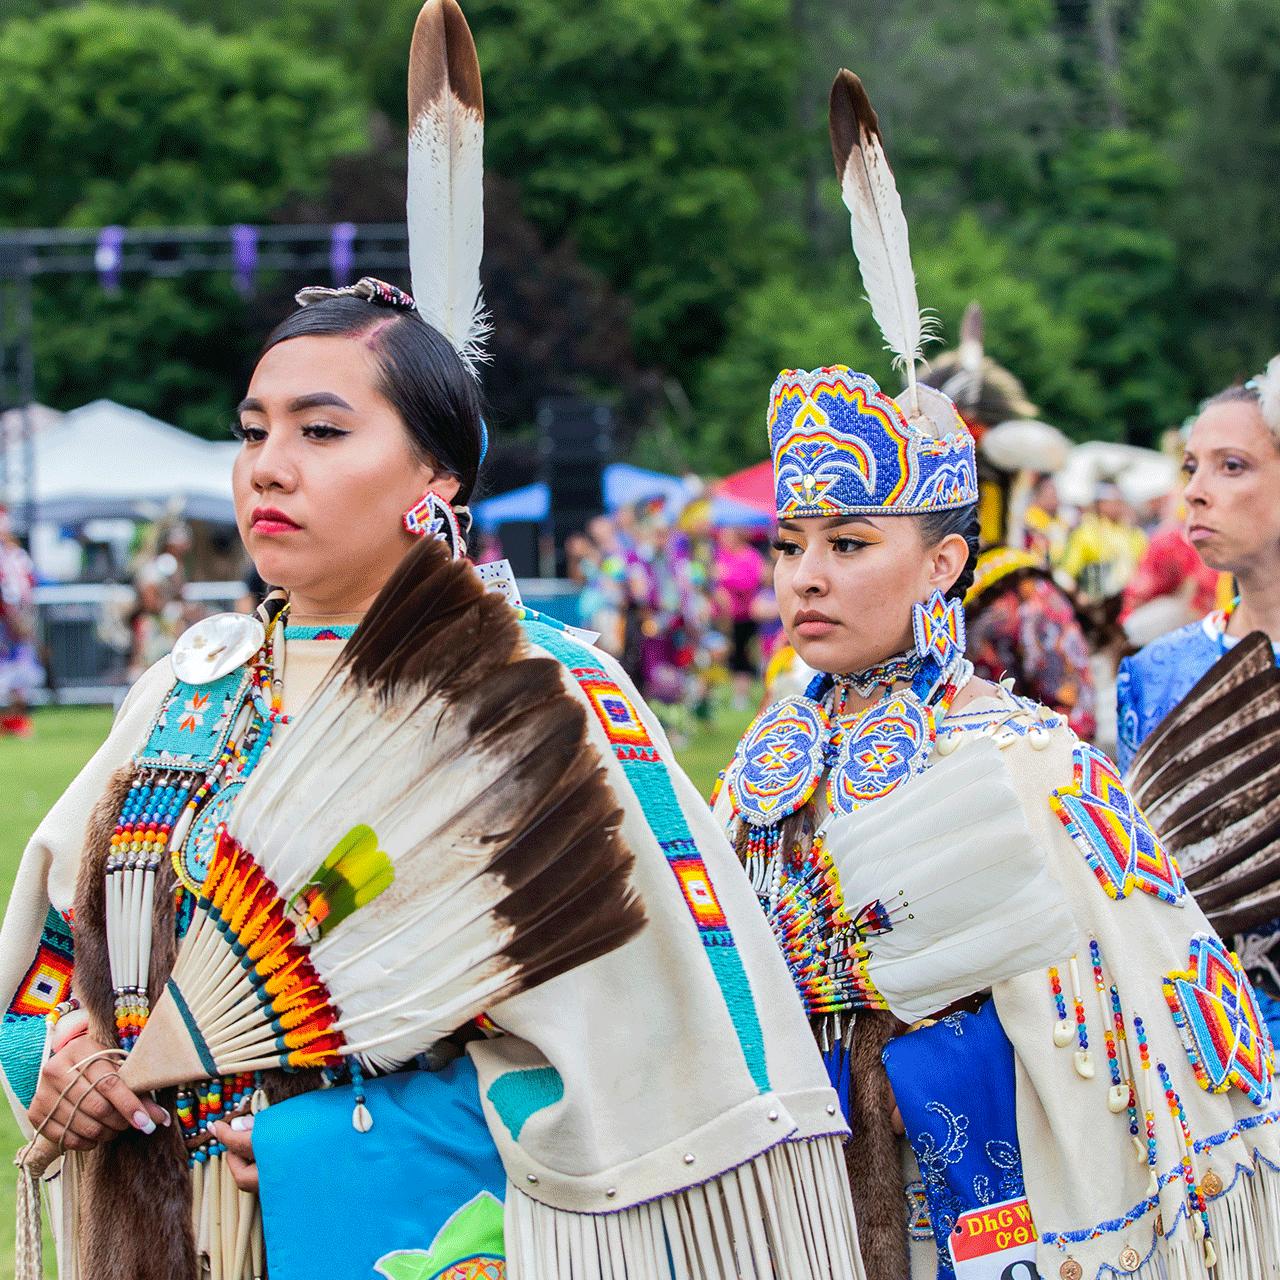 20 Amazing Photos from the 2018 Cherokee Powwow | Cherokee, NC